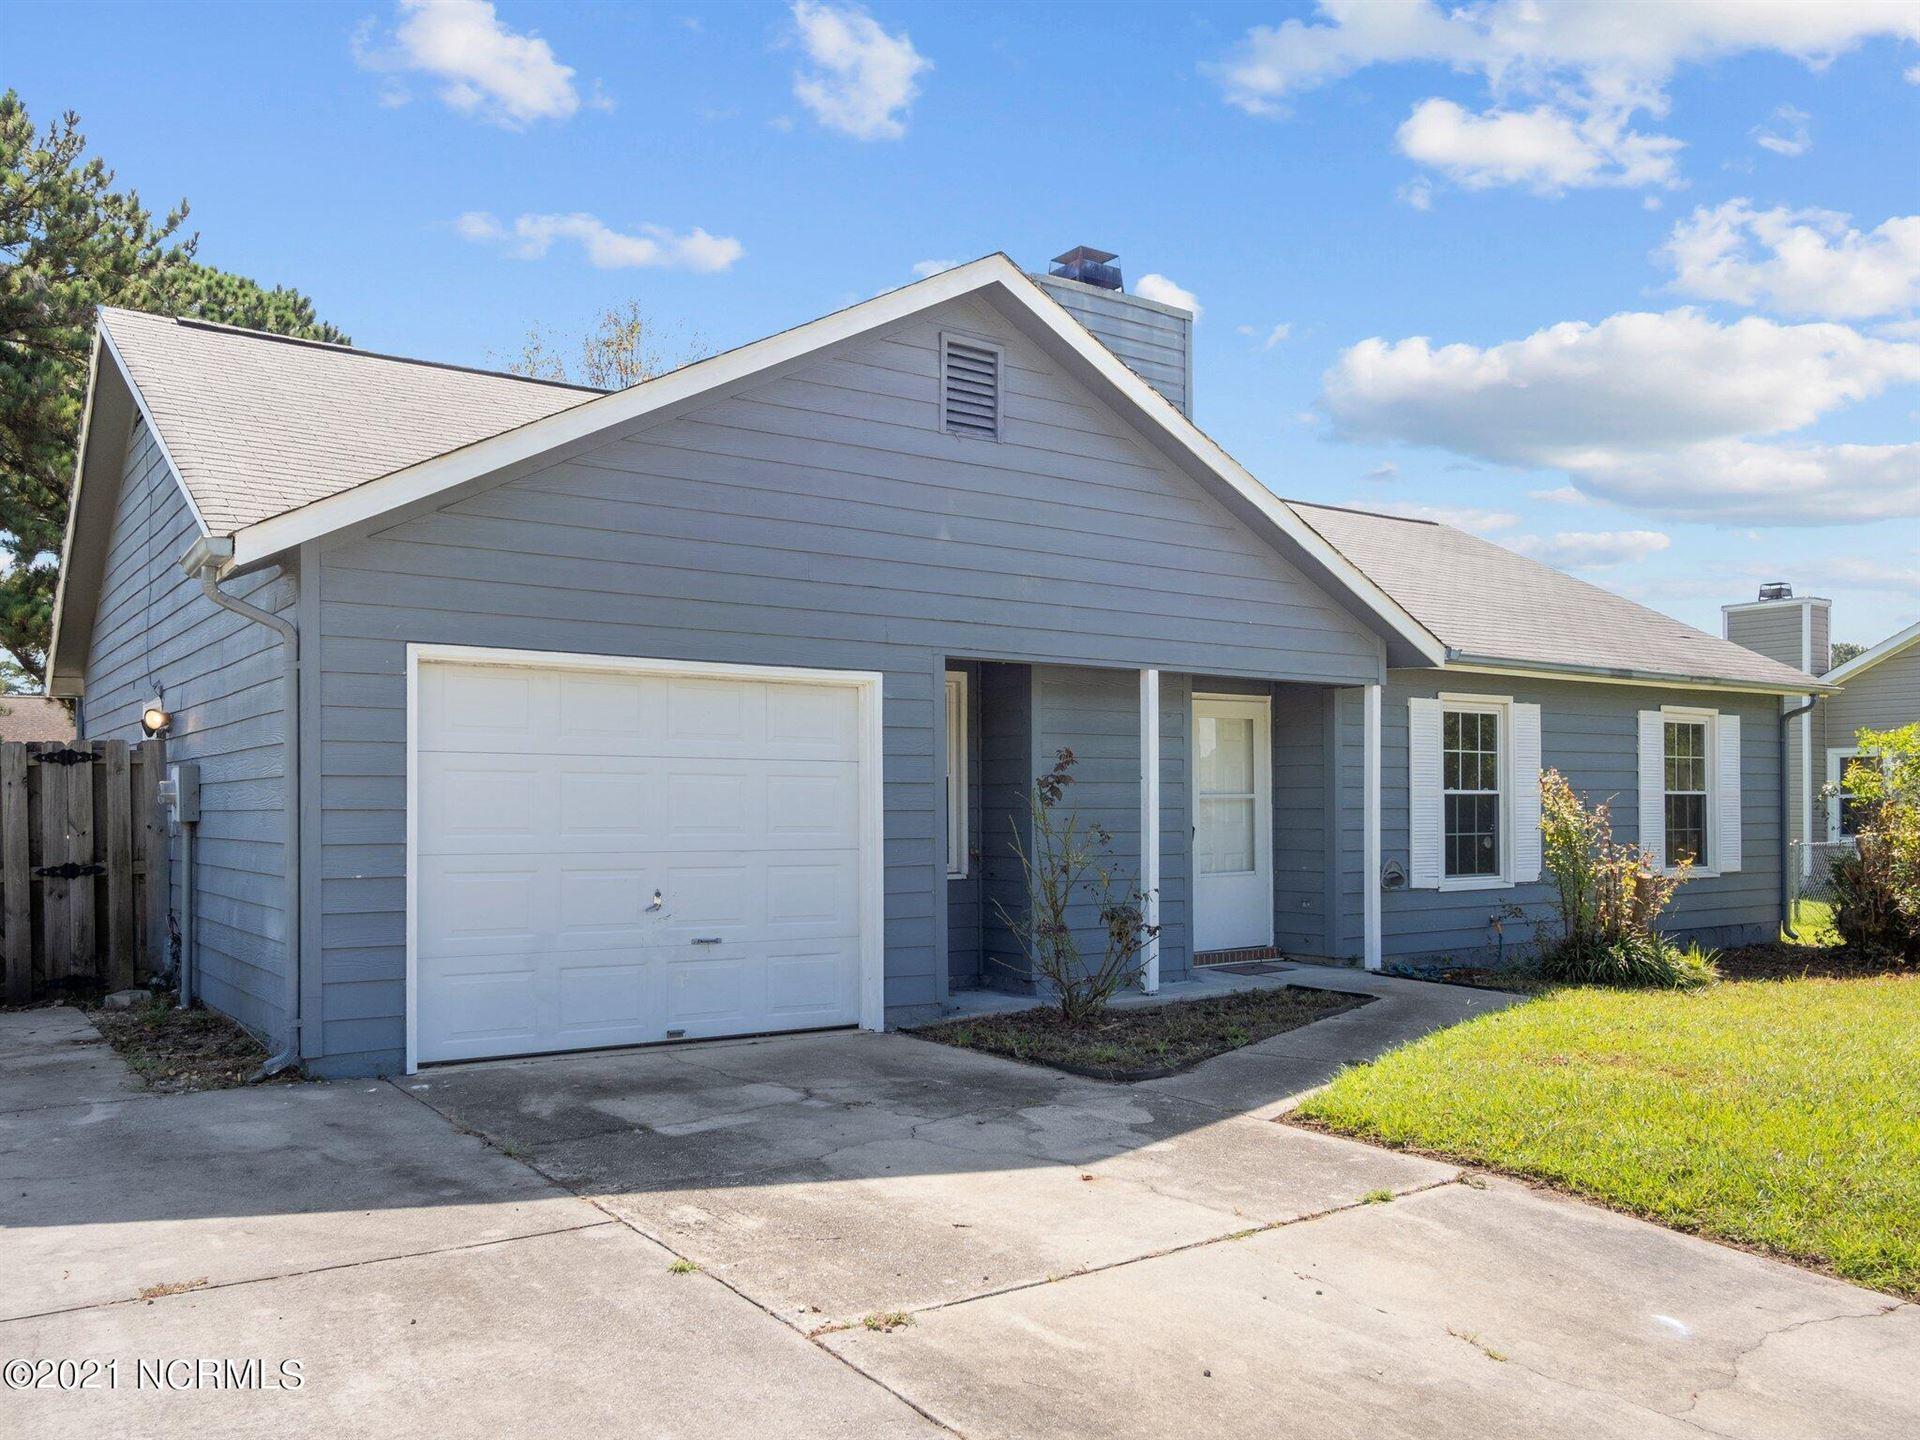 Photo of 318 Quail Ridge Road, Jacksonville, NC 28546 (MLS # 100290356)